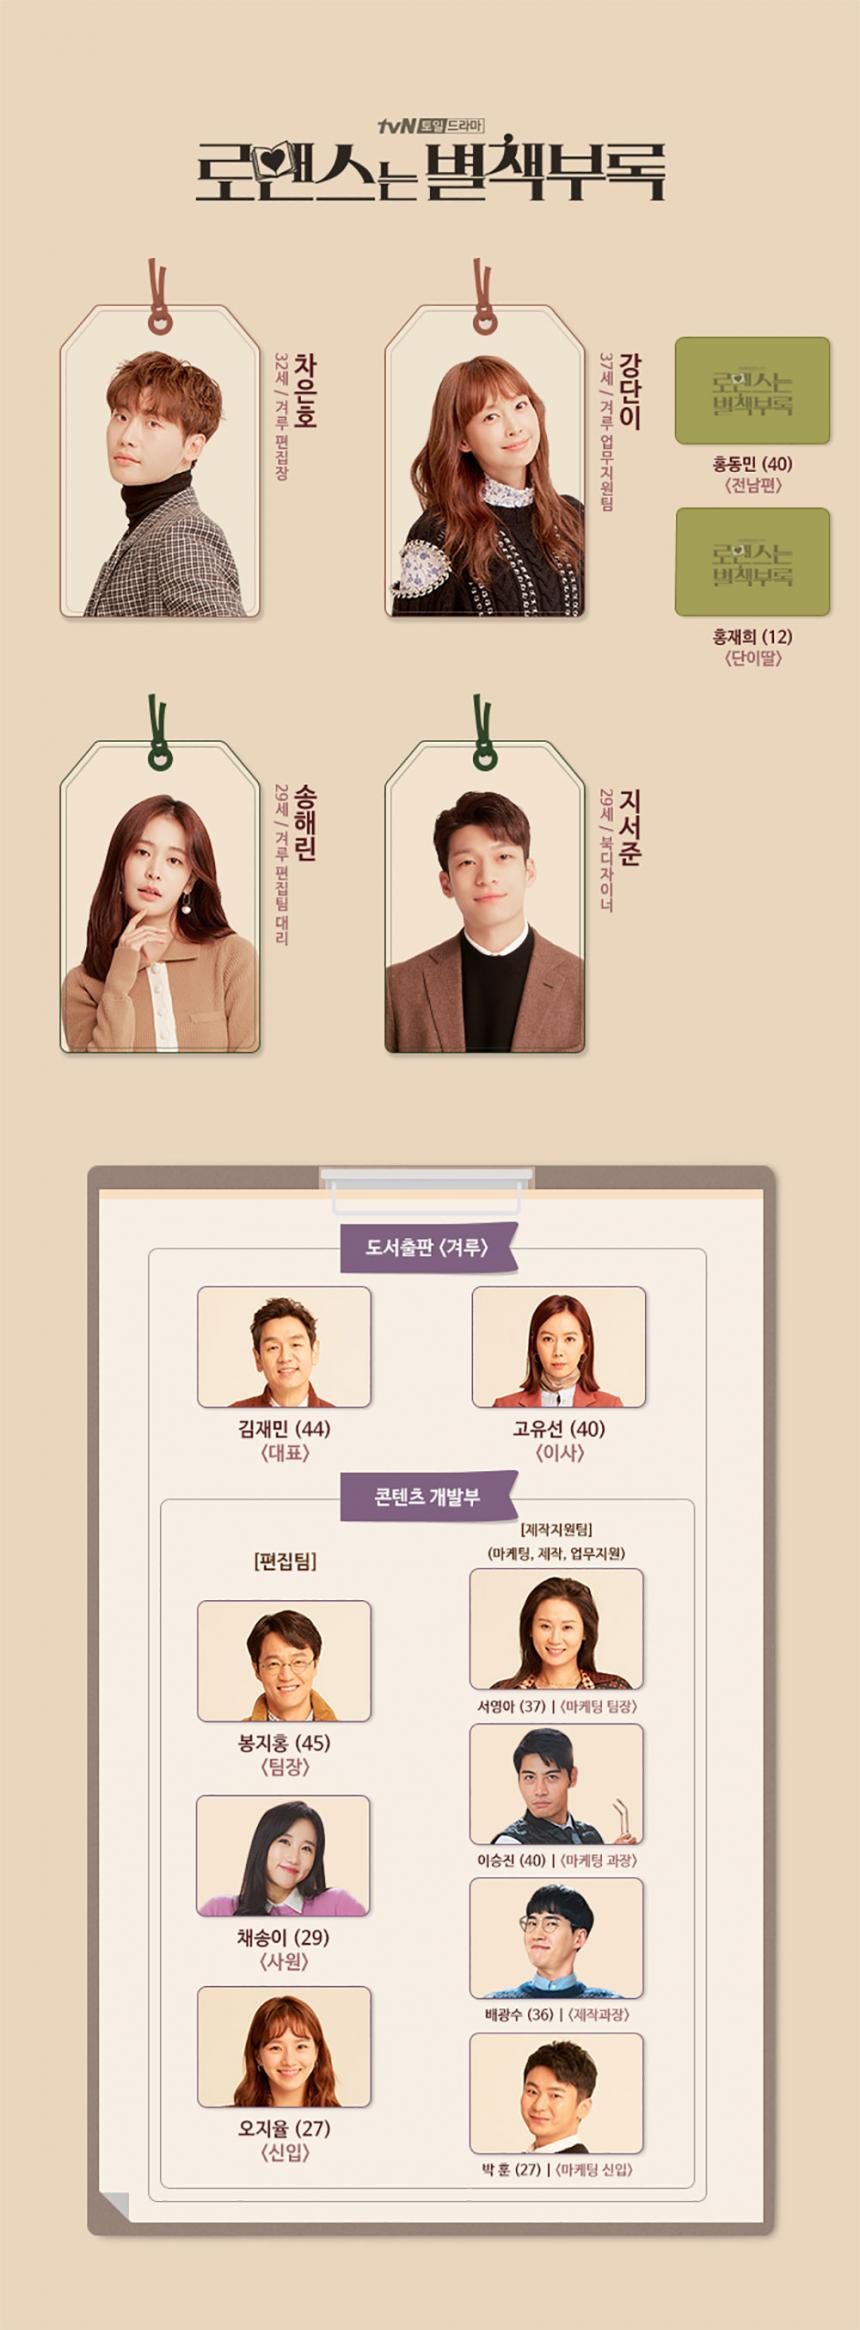 tvN '로맨스는 별책부록'